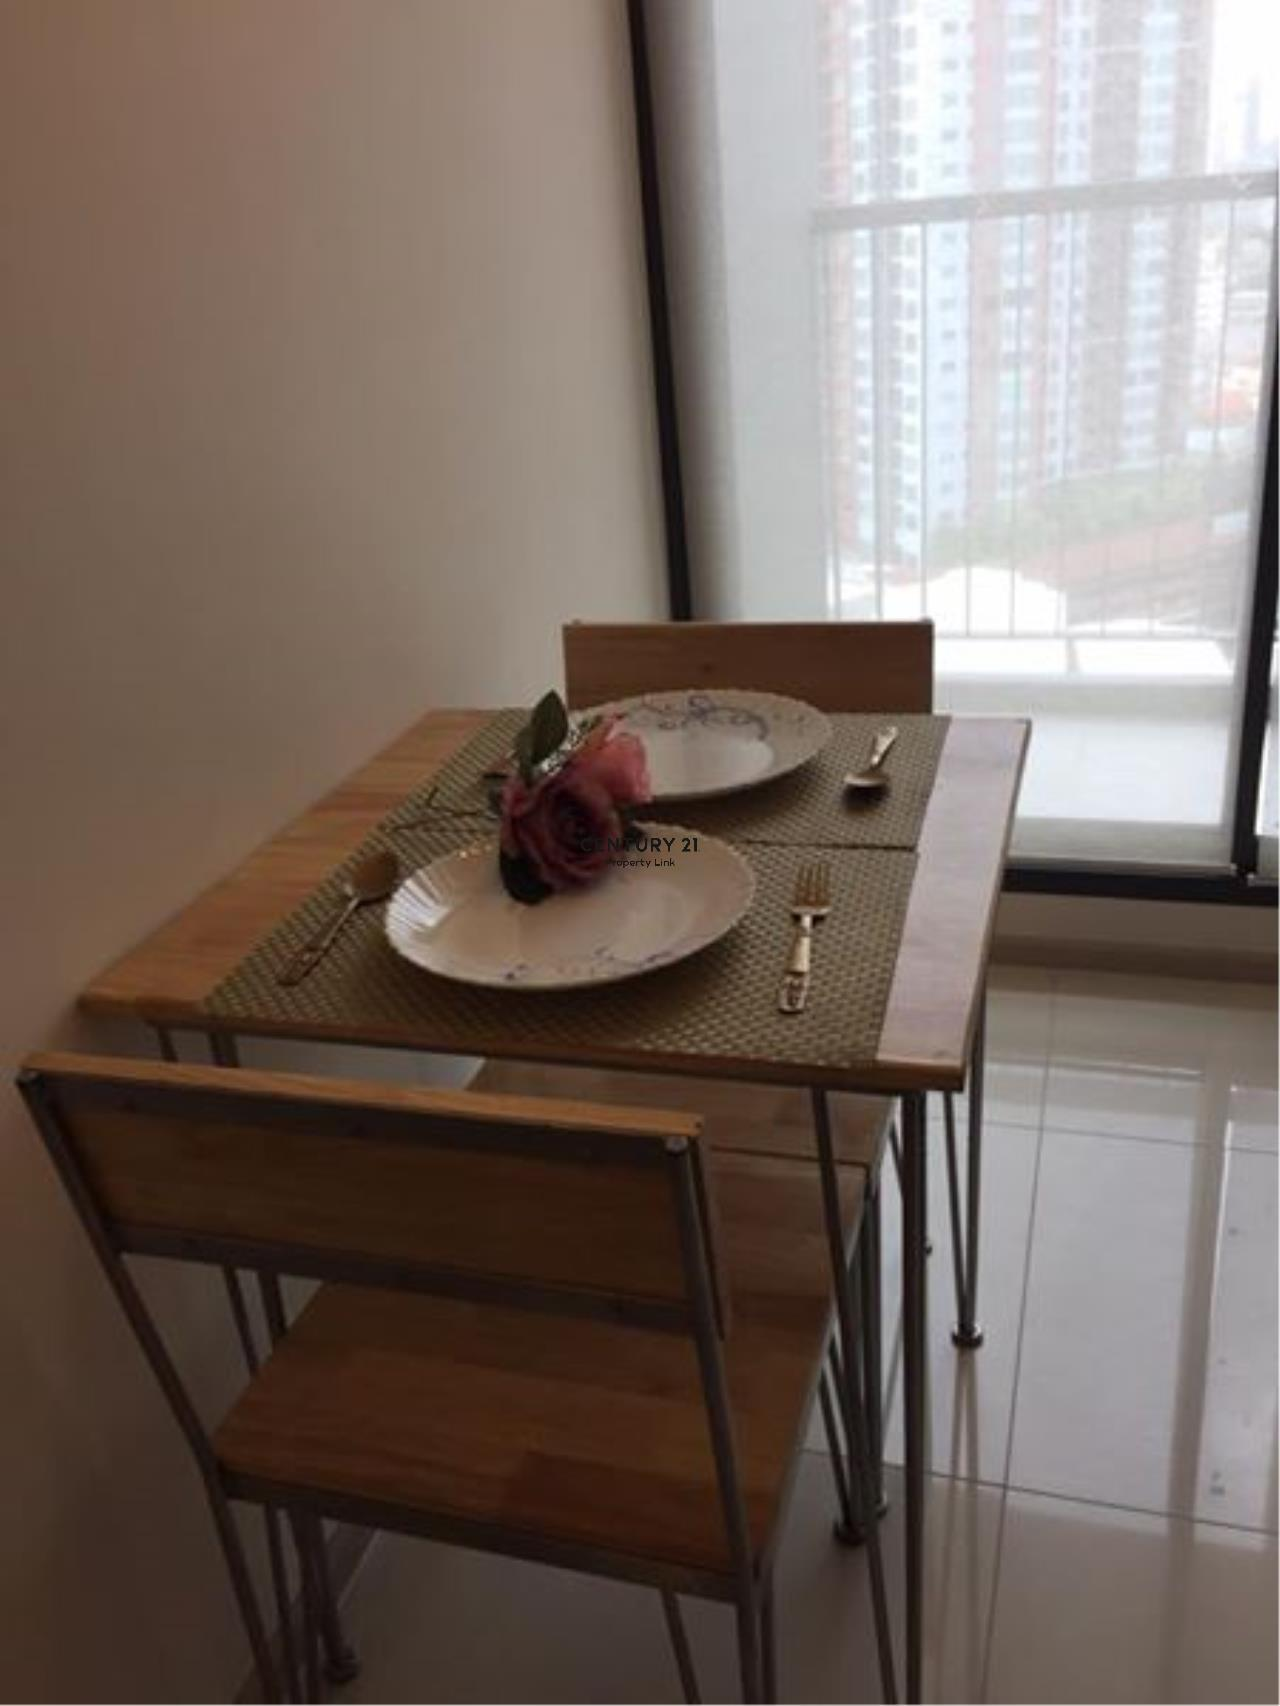 Century21 Property Link Agency's 39-CC-61588 Life Sukhumvit 48 Room For Rent Near BTS Phra Khanong Sukhumvit Road 1 Bedroom 17,000 THB./ Month 6